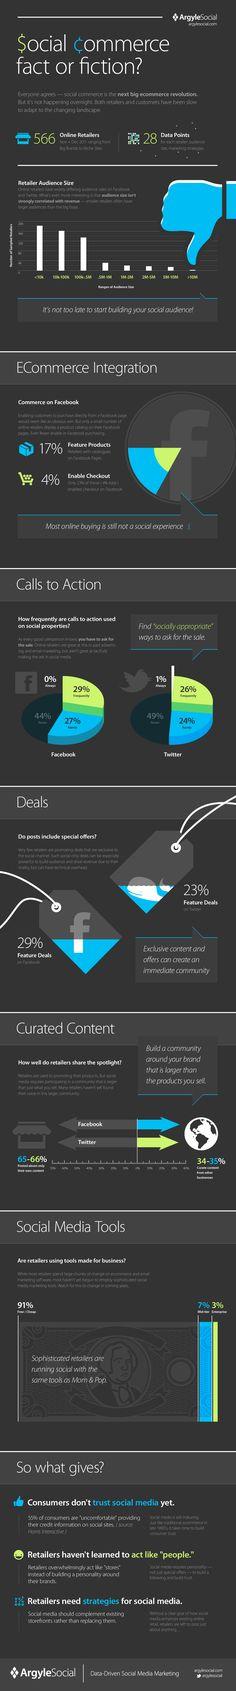 Social Commerce - Fact or Fiction?     #socialmedia #infographic #argyle #sharifkhalladi    For more stuff like this follow me on Twitter www.twitter.com/sharifkhalladi